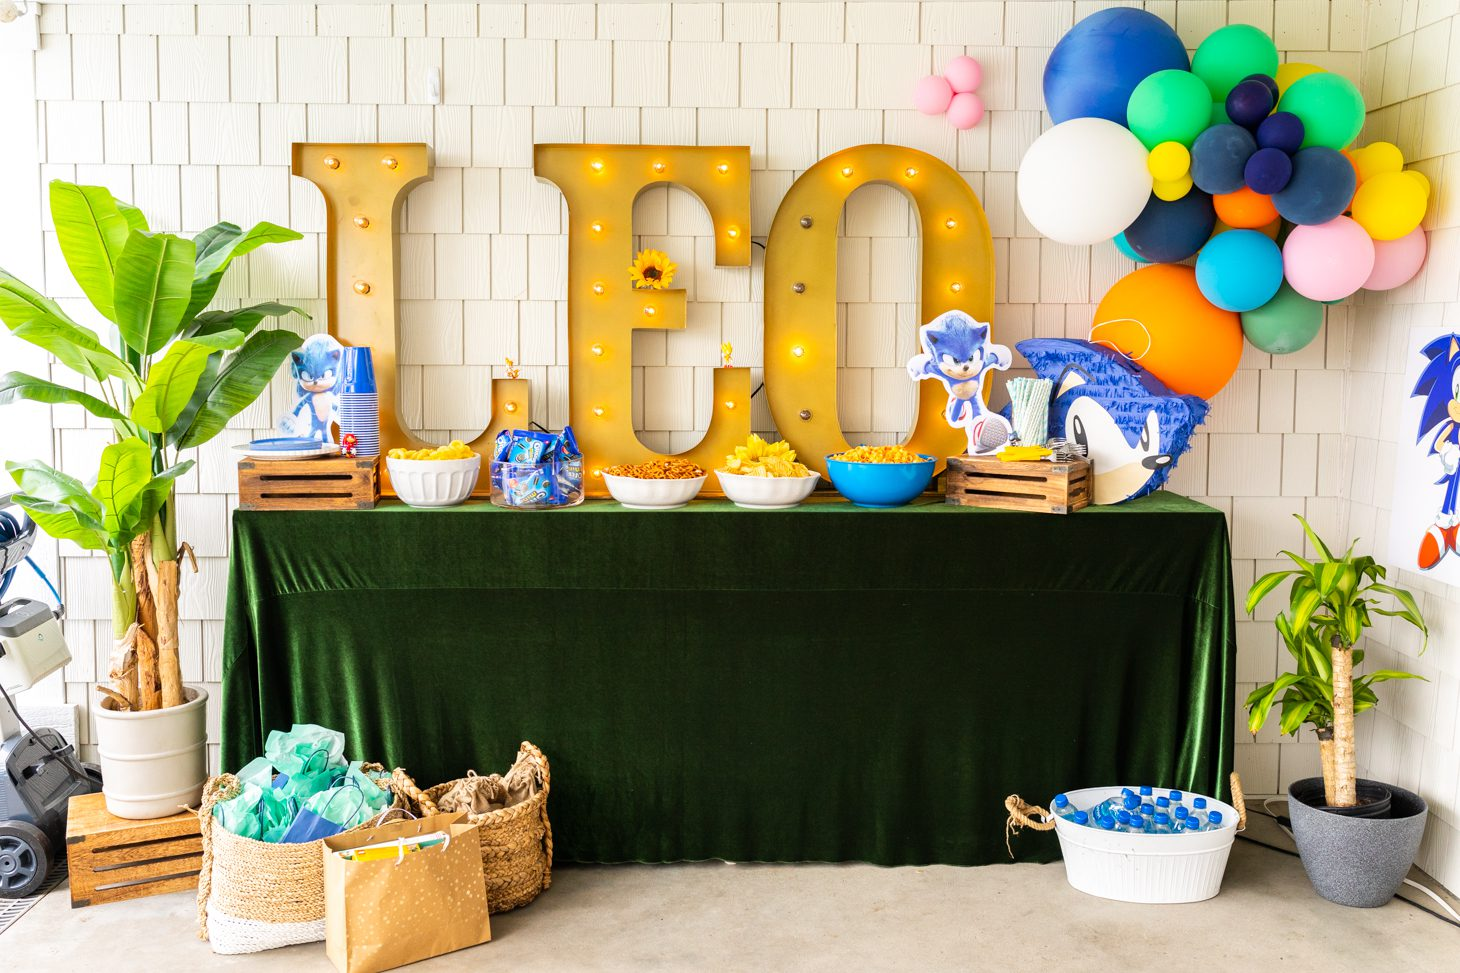 Leo Pasutto's 5th birthday decor